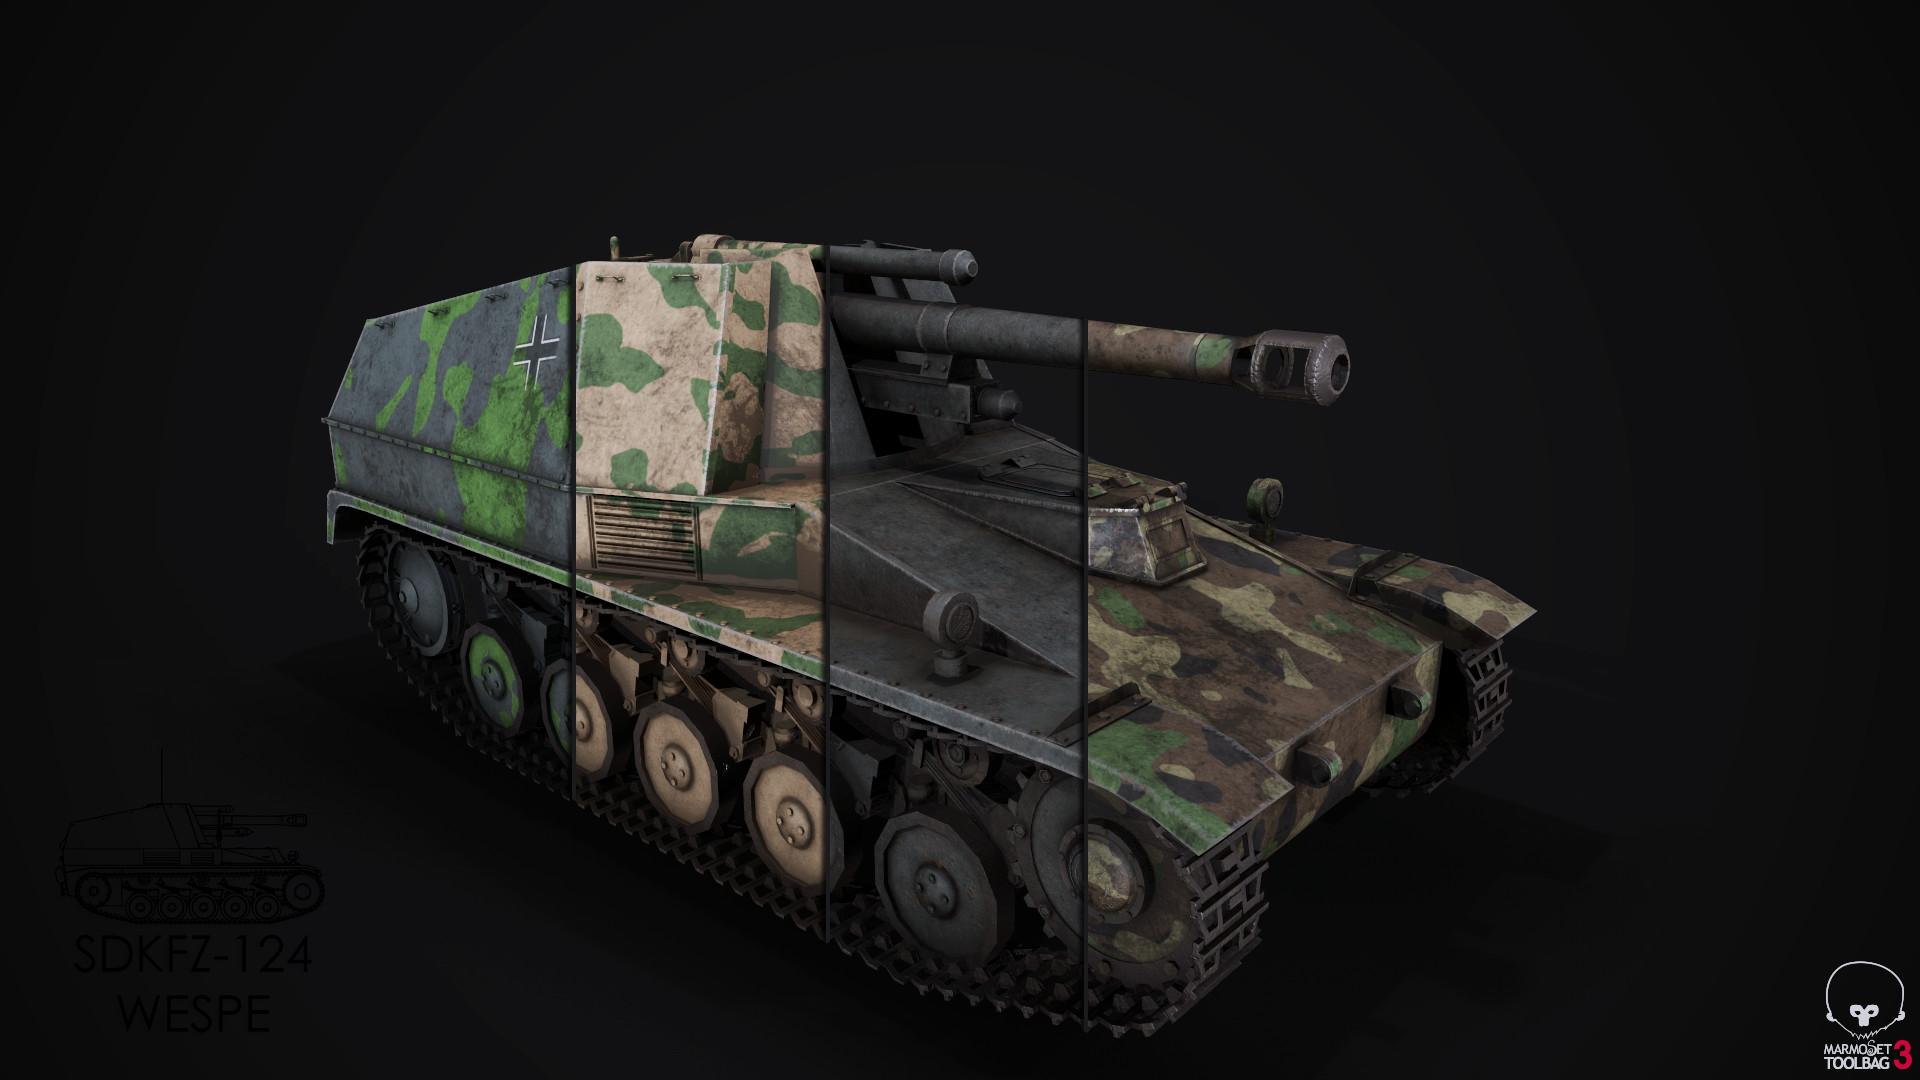 Serdar cendik kapakwespe panzer